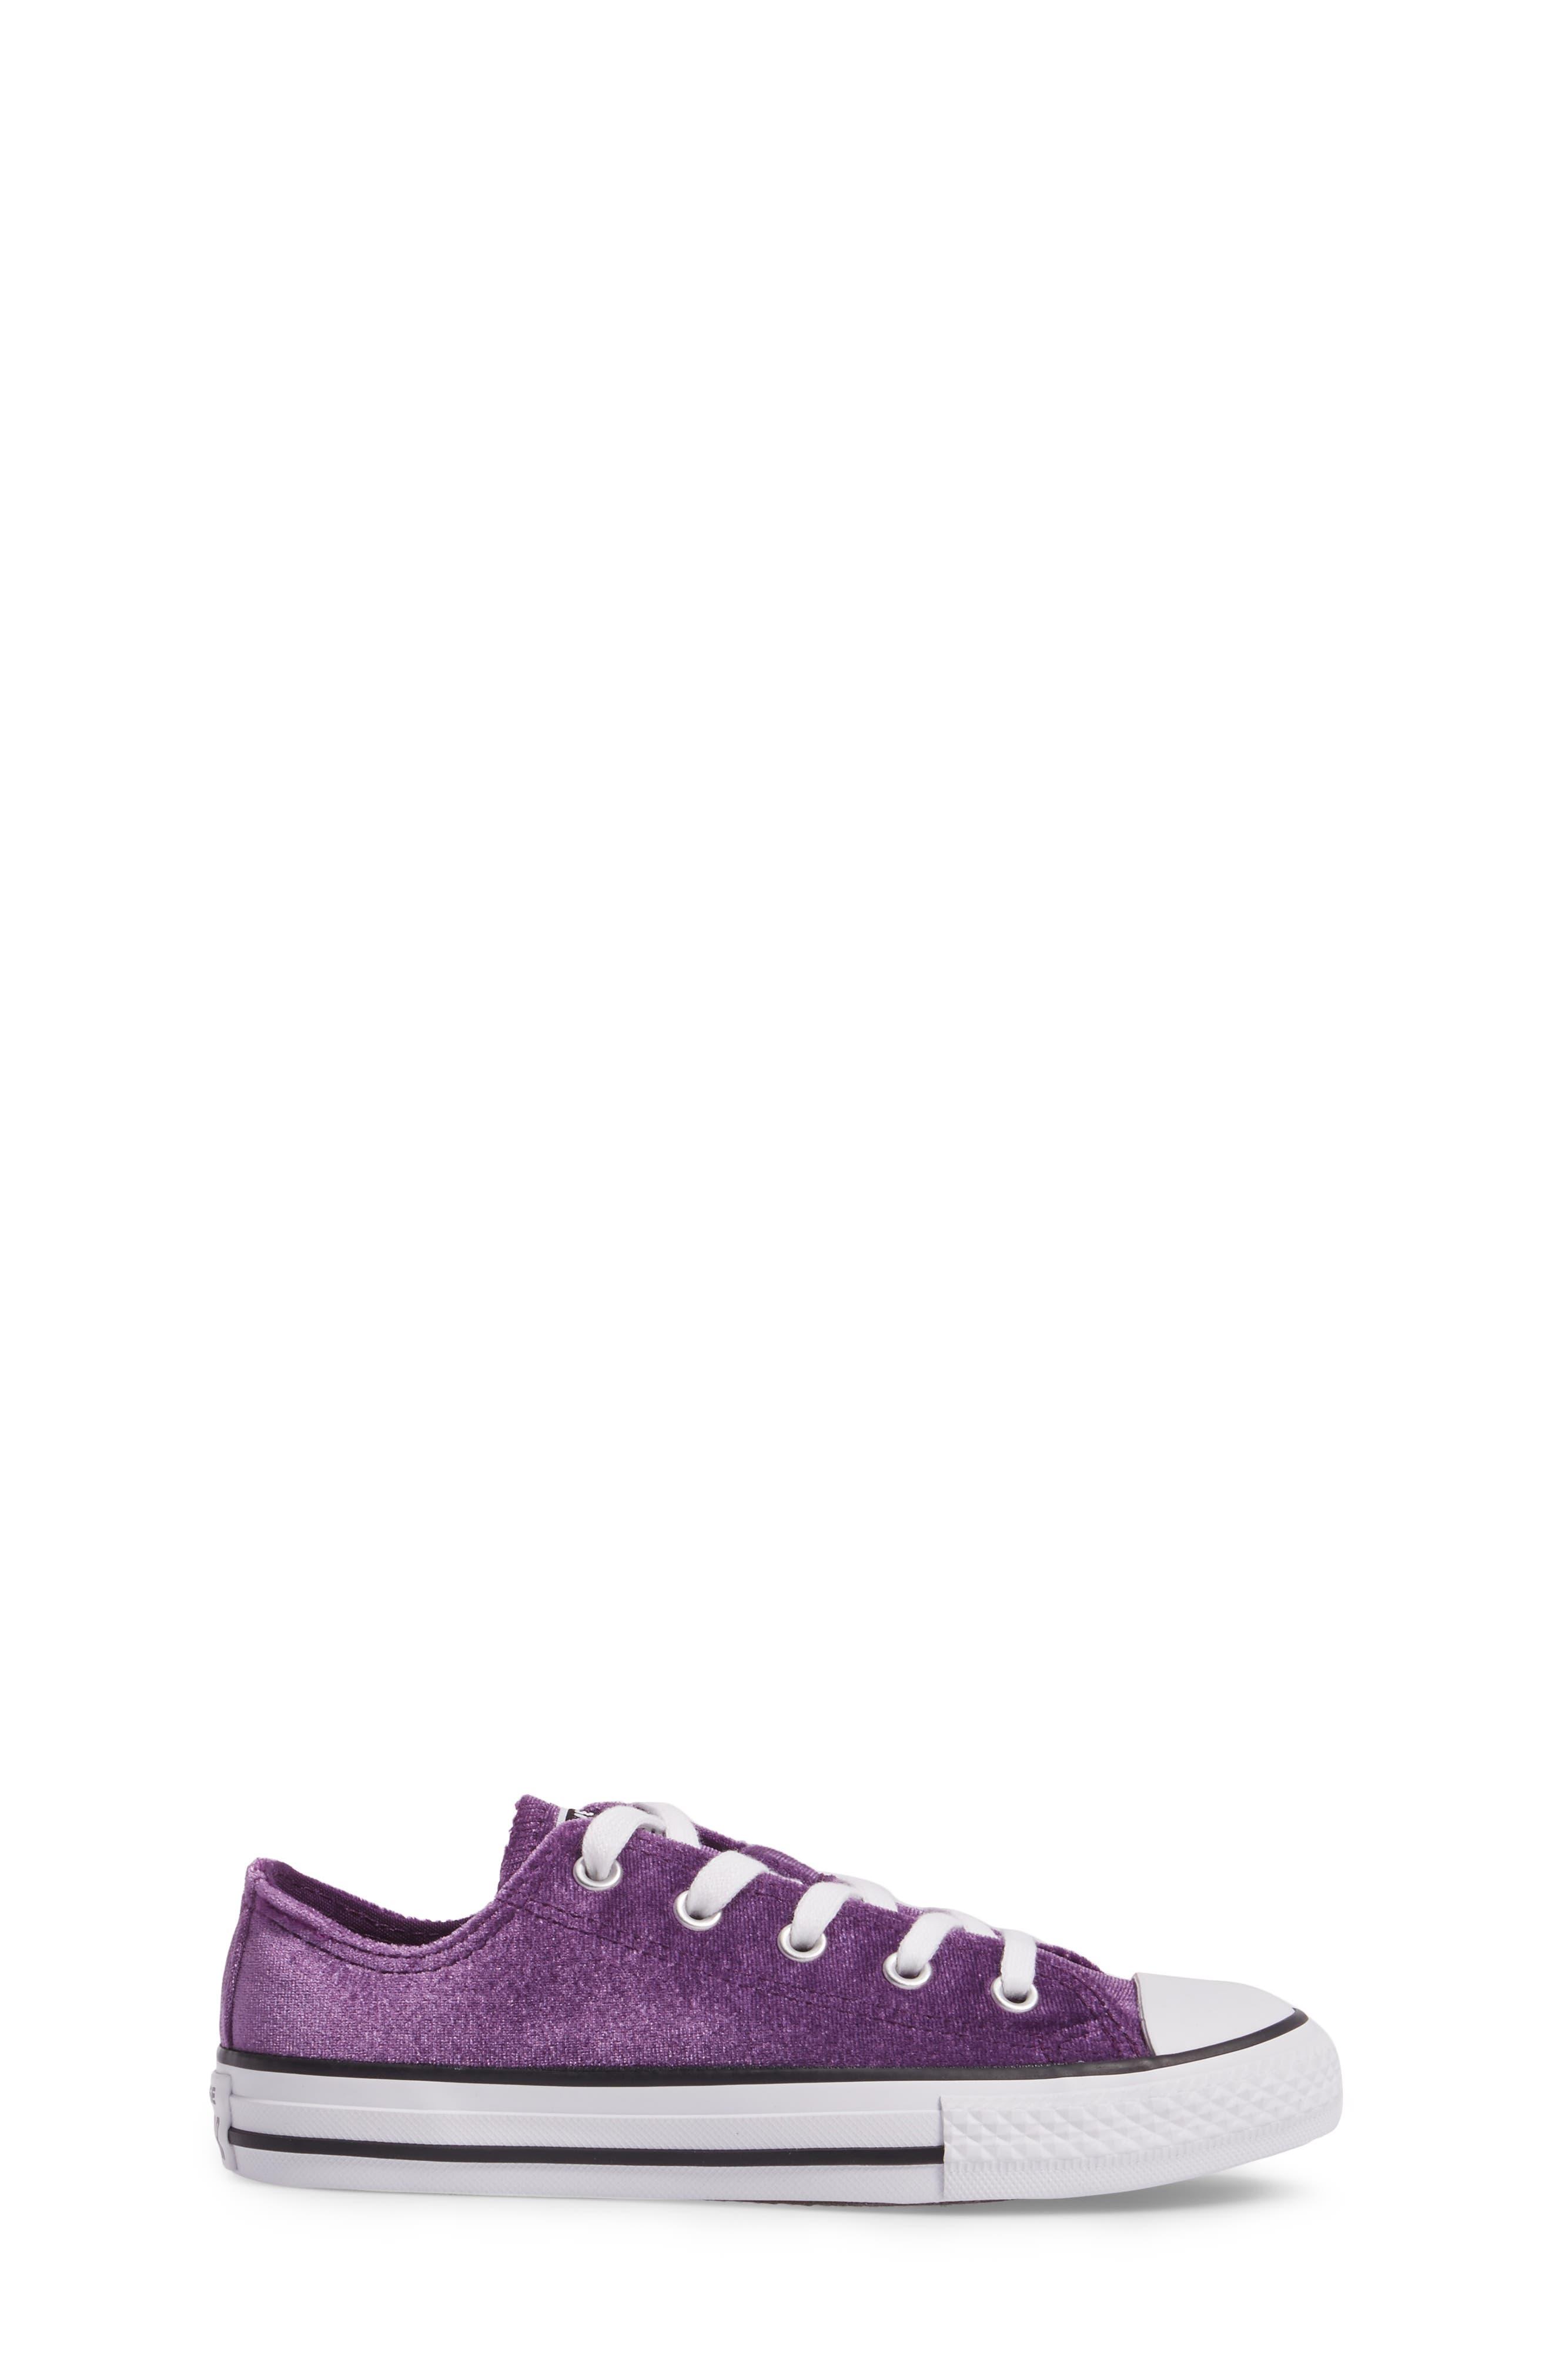 Chuck Taylor<sup>®</sup> All Star<sup>®</sup> Velvet OX Low Top Sneaker,                             Alternate thumbnail 3, color,                             Night Purple Velvet